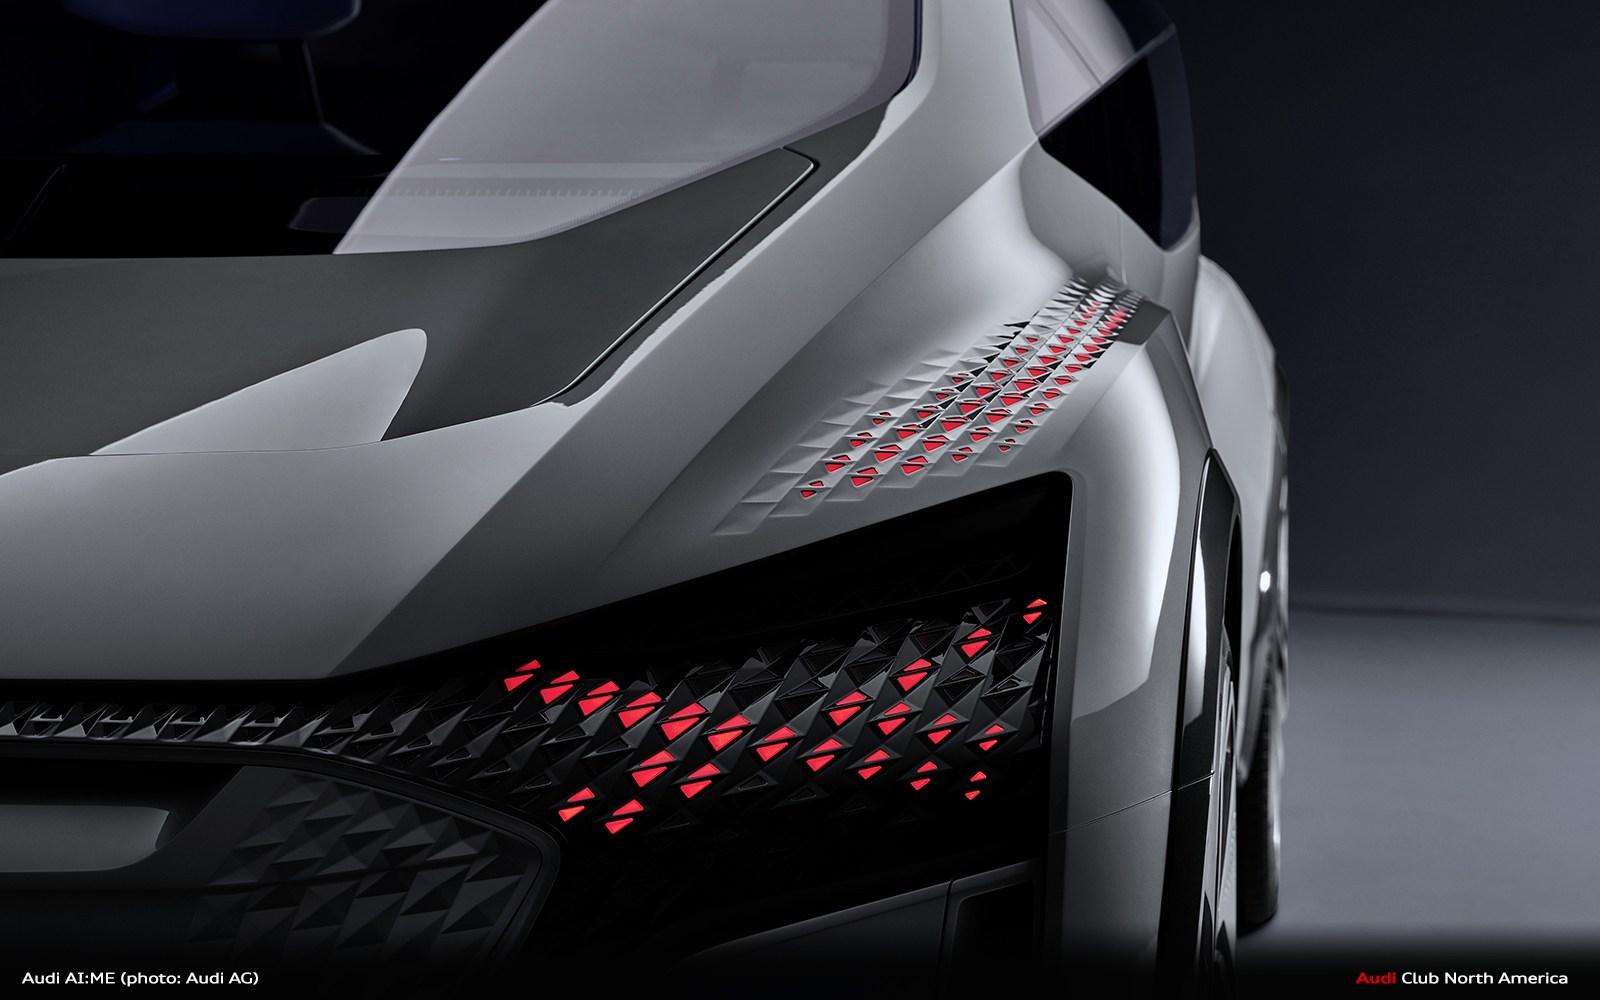 Audi Develops New Digital OLED Technology for Customizable Rear Lights